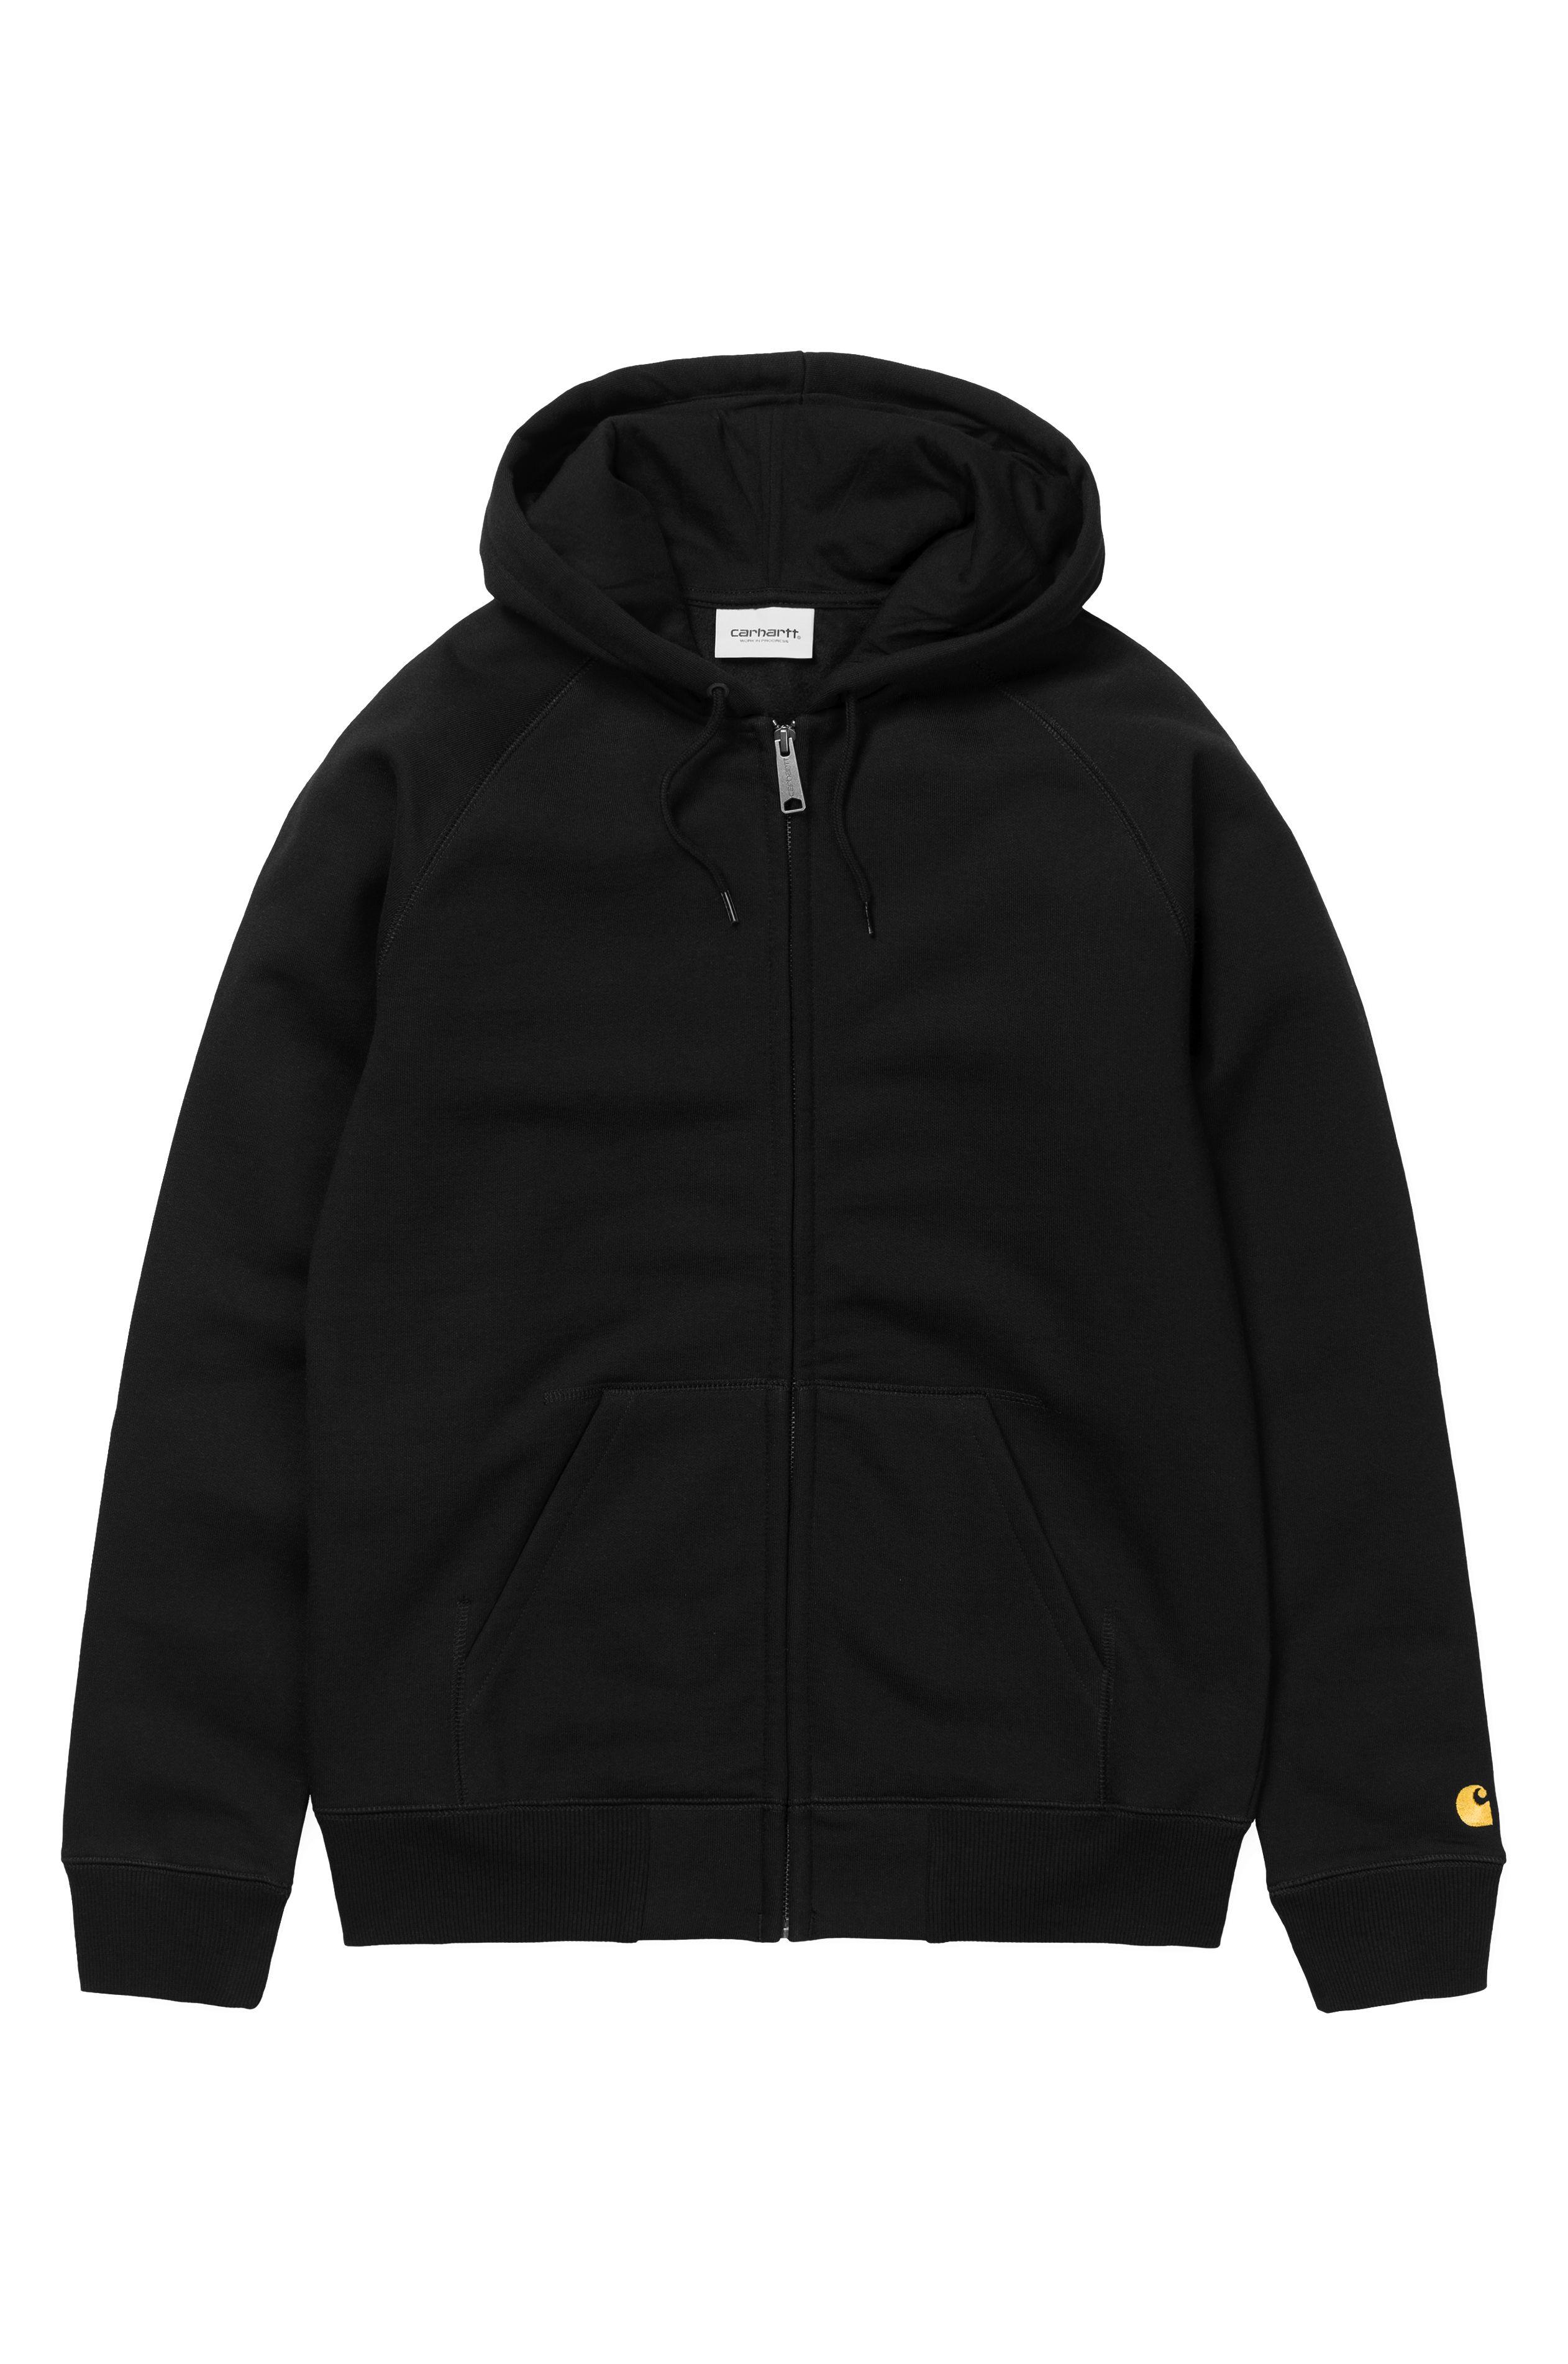 Carhartt WIP Sweat Zip Hood CHASE Black/Gold